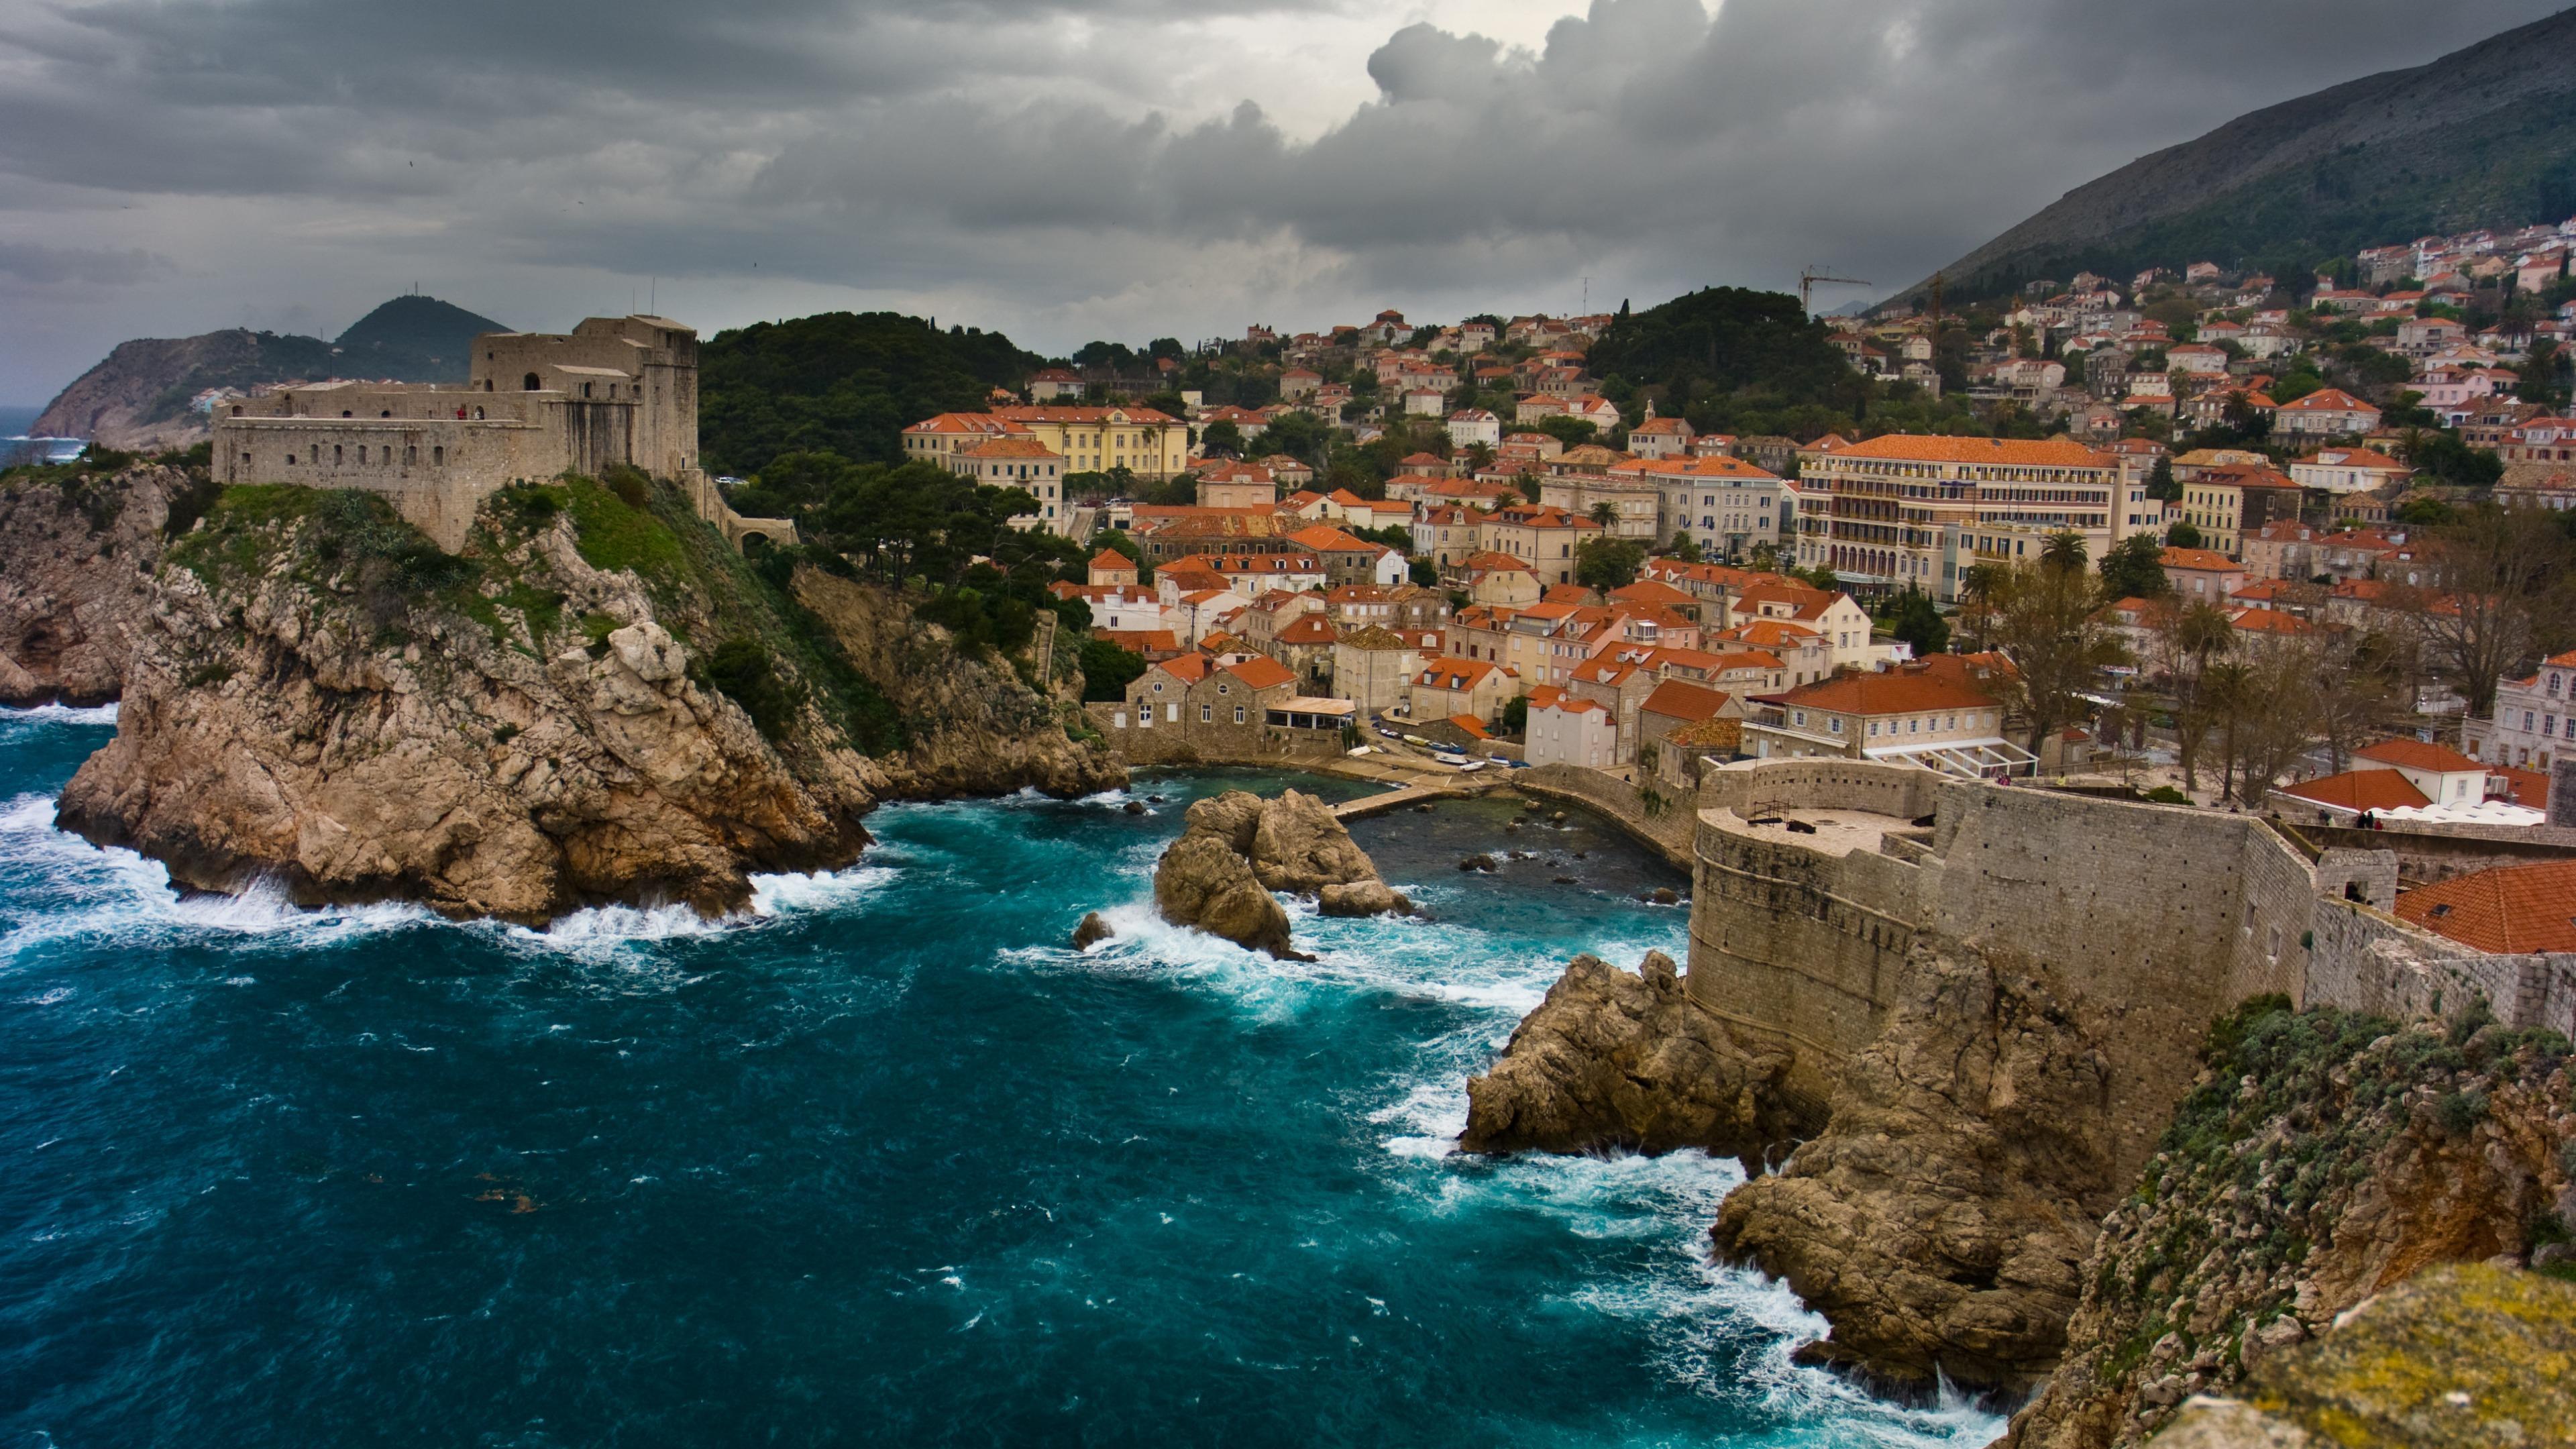 Fort Lovrijenac (Dubrovnik) wallpaper